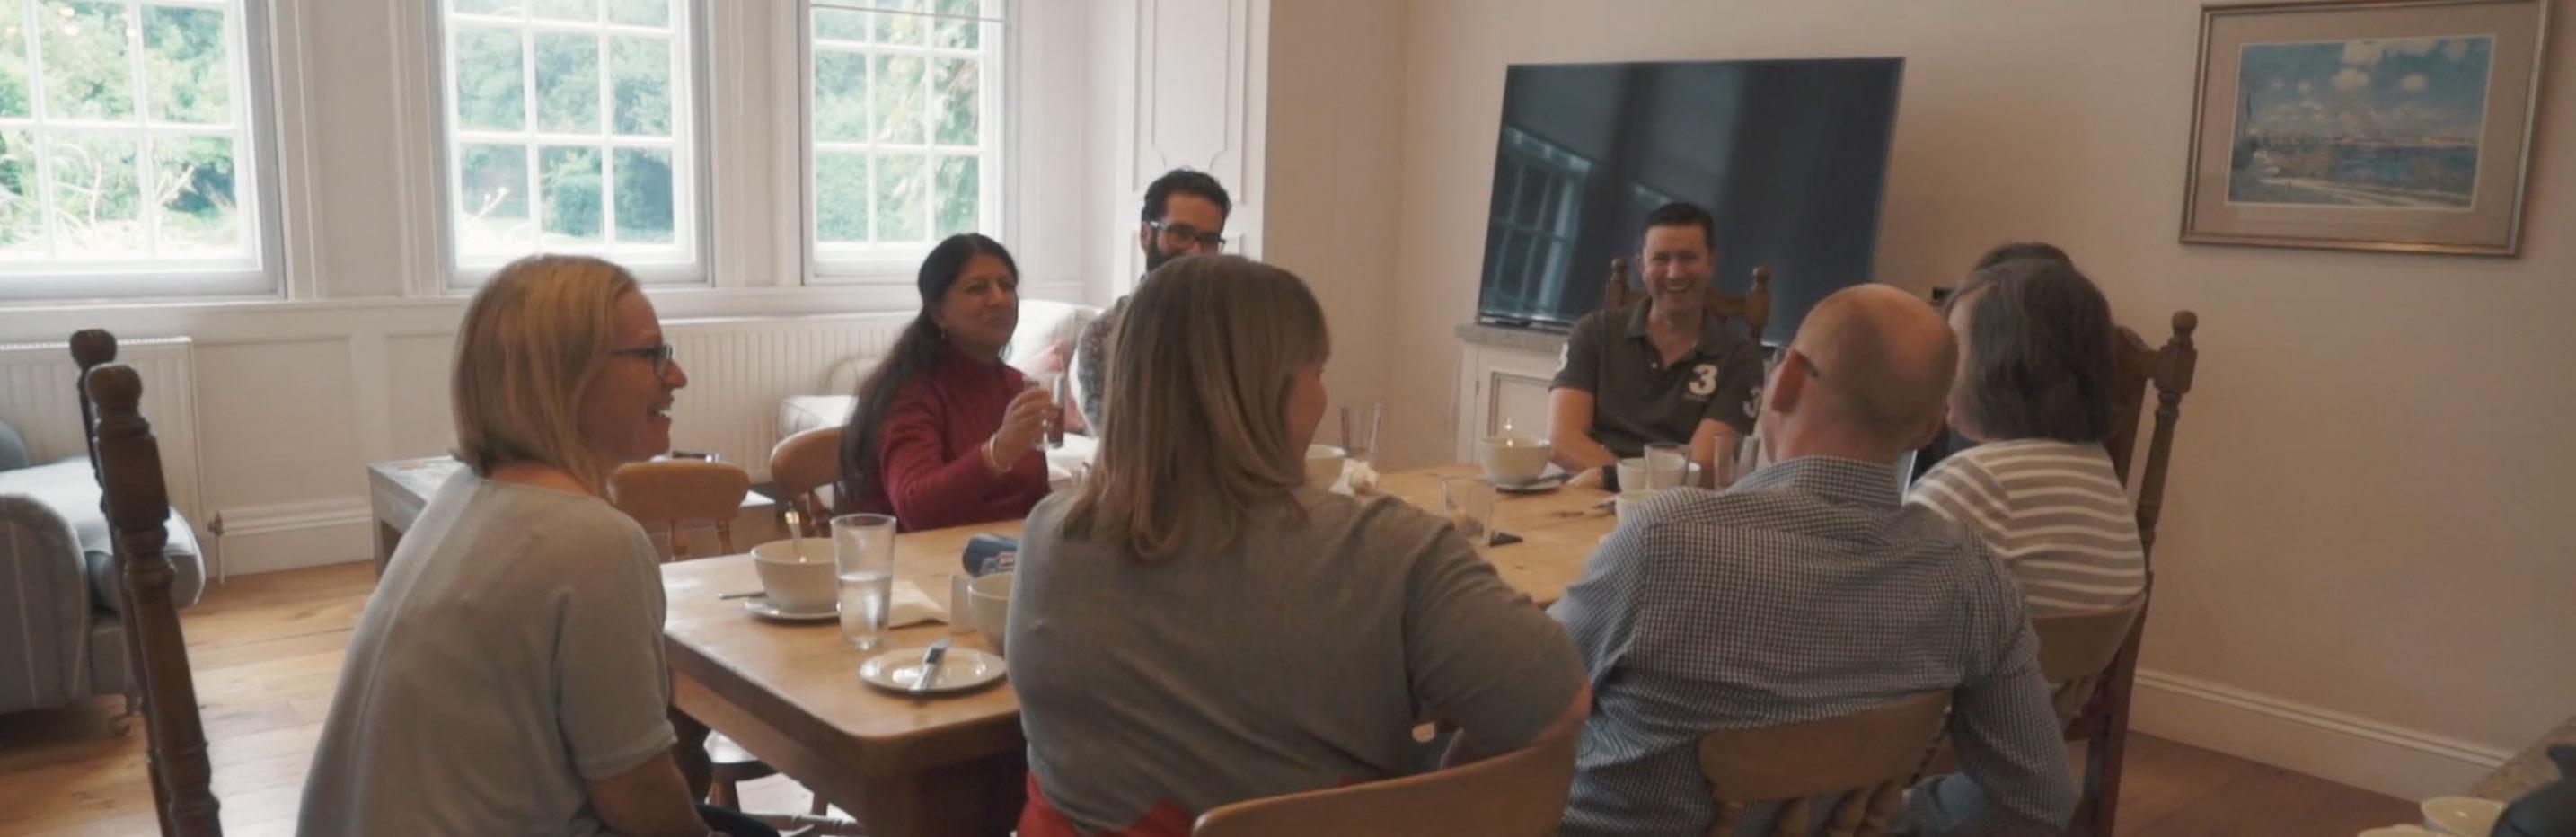 Muru Leadership - Discussion Group